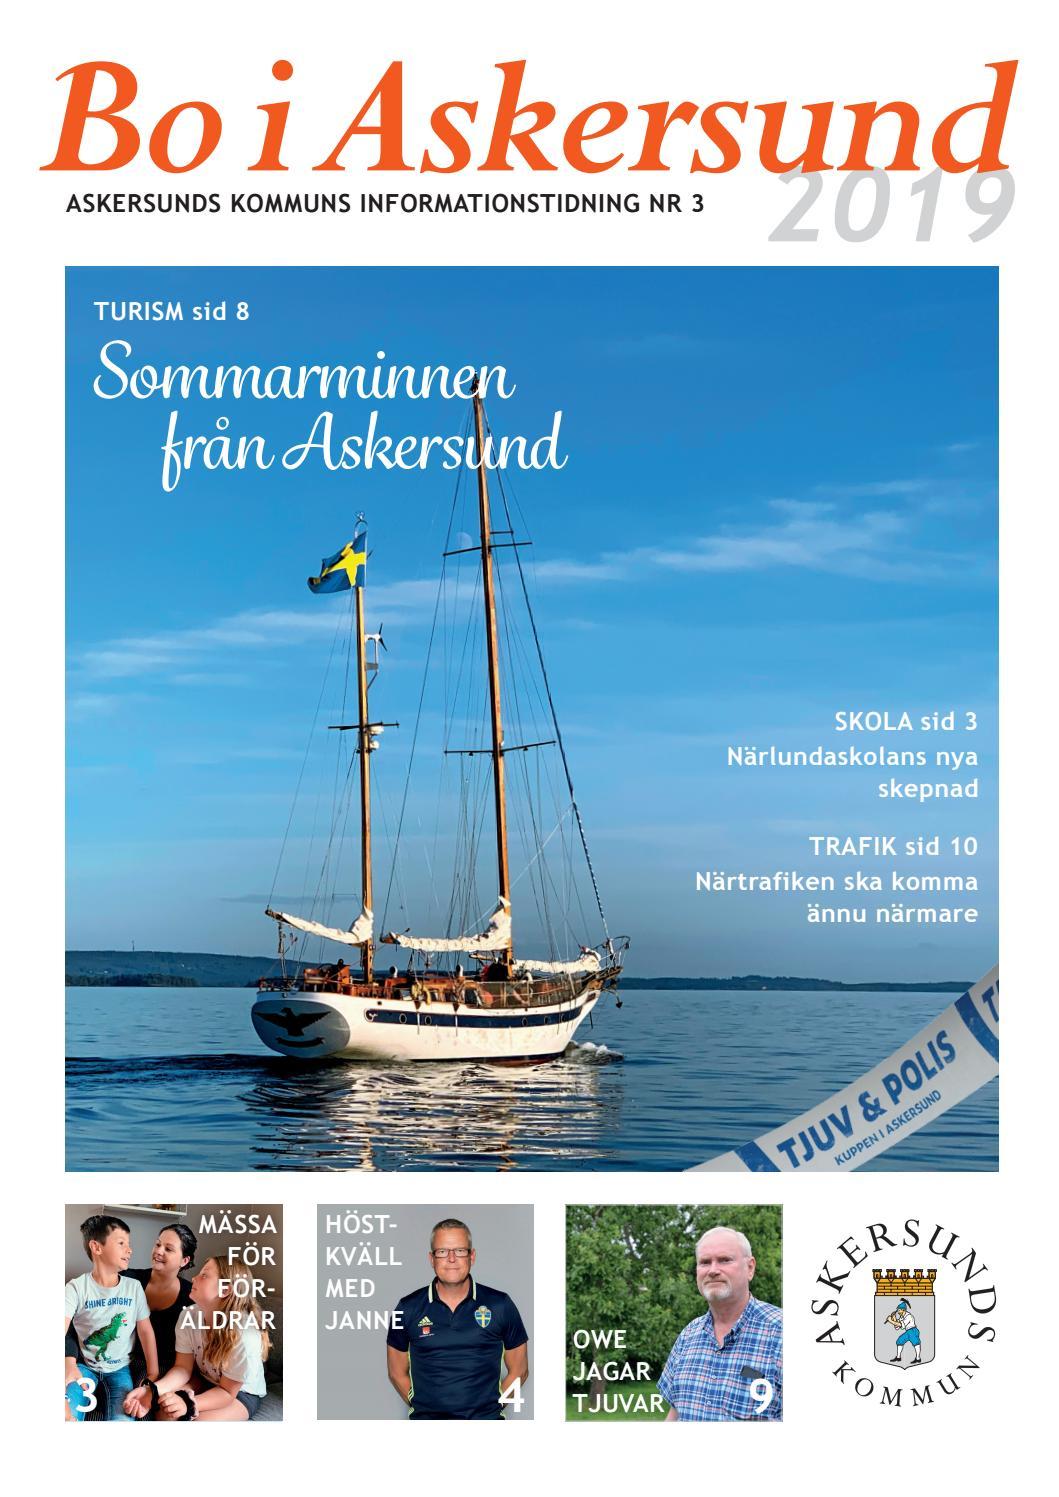 Nyinflyttade p Storgatan 42, Askersund | satisfaction-survey.net